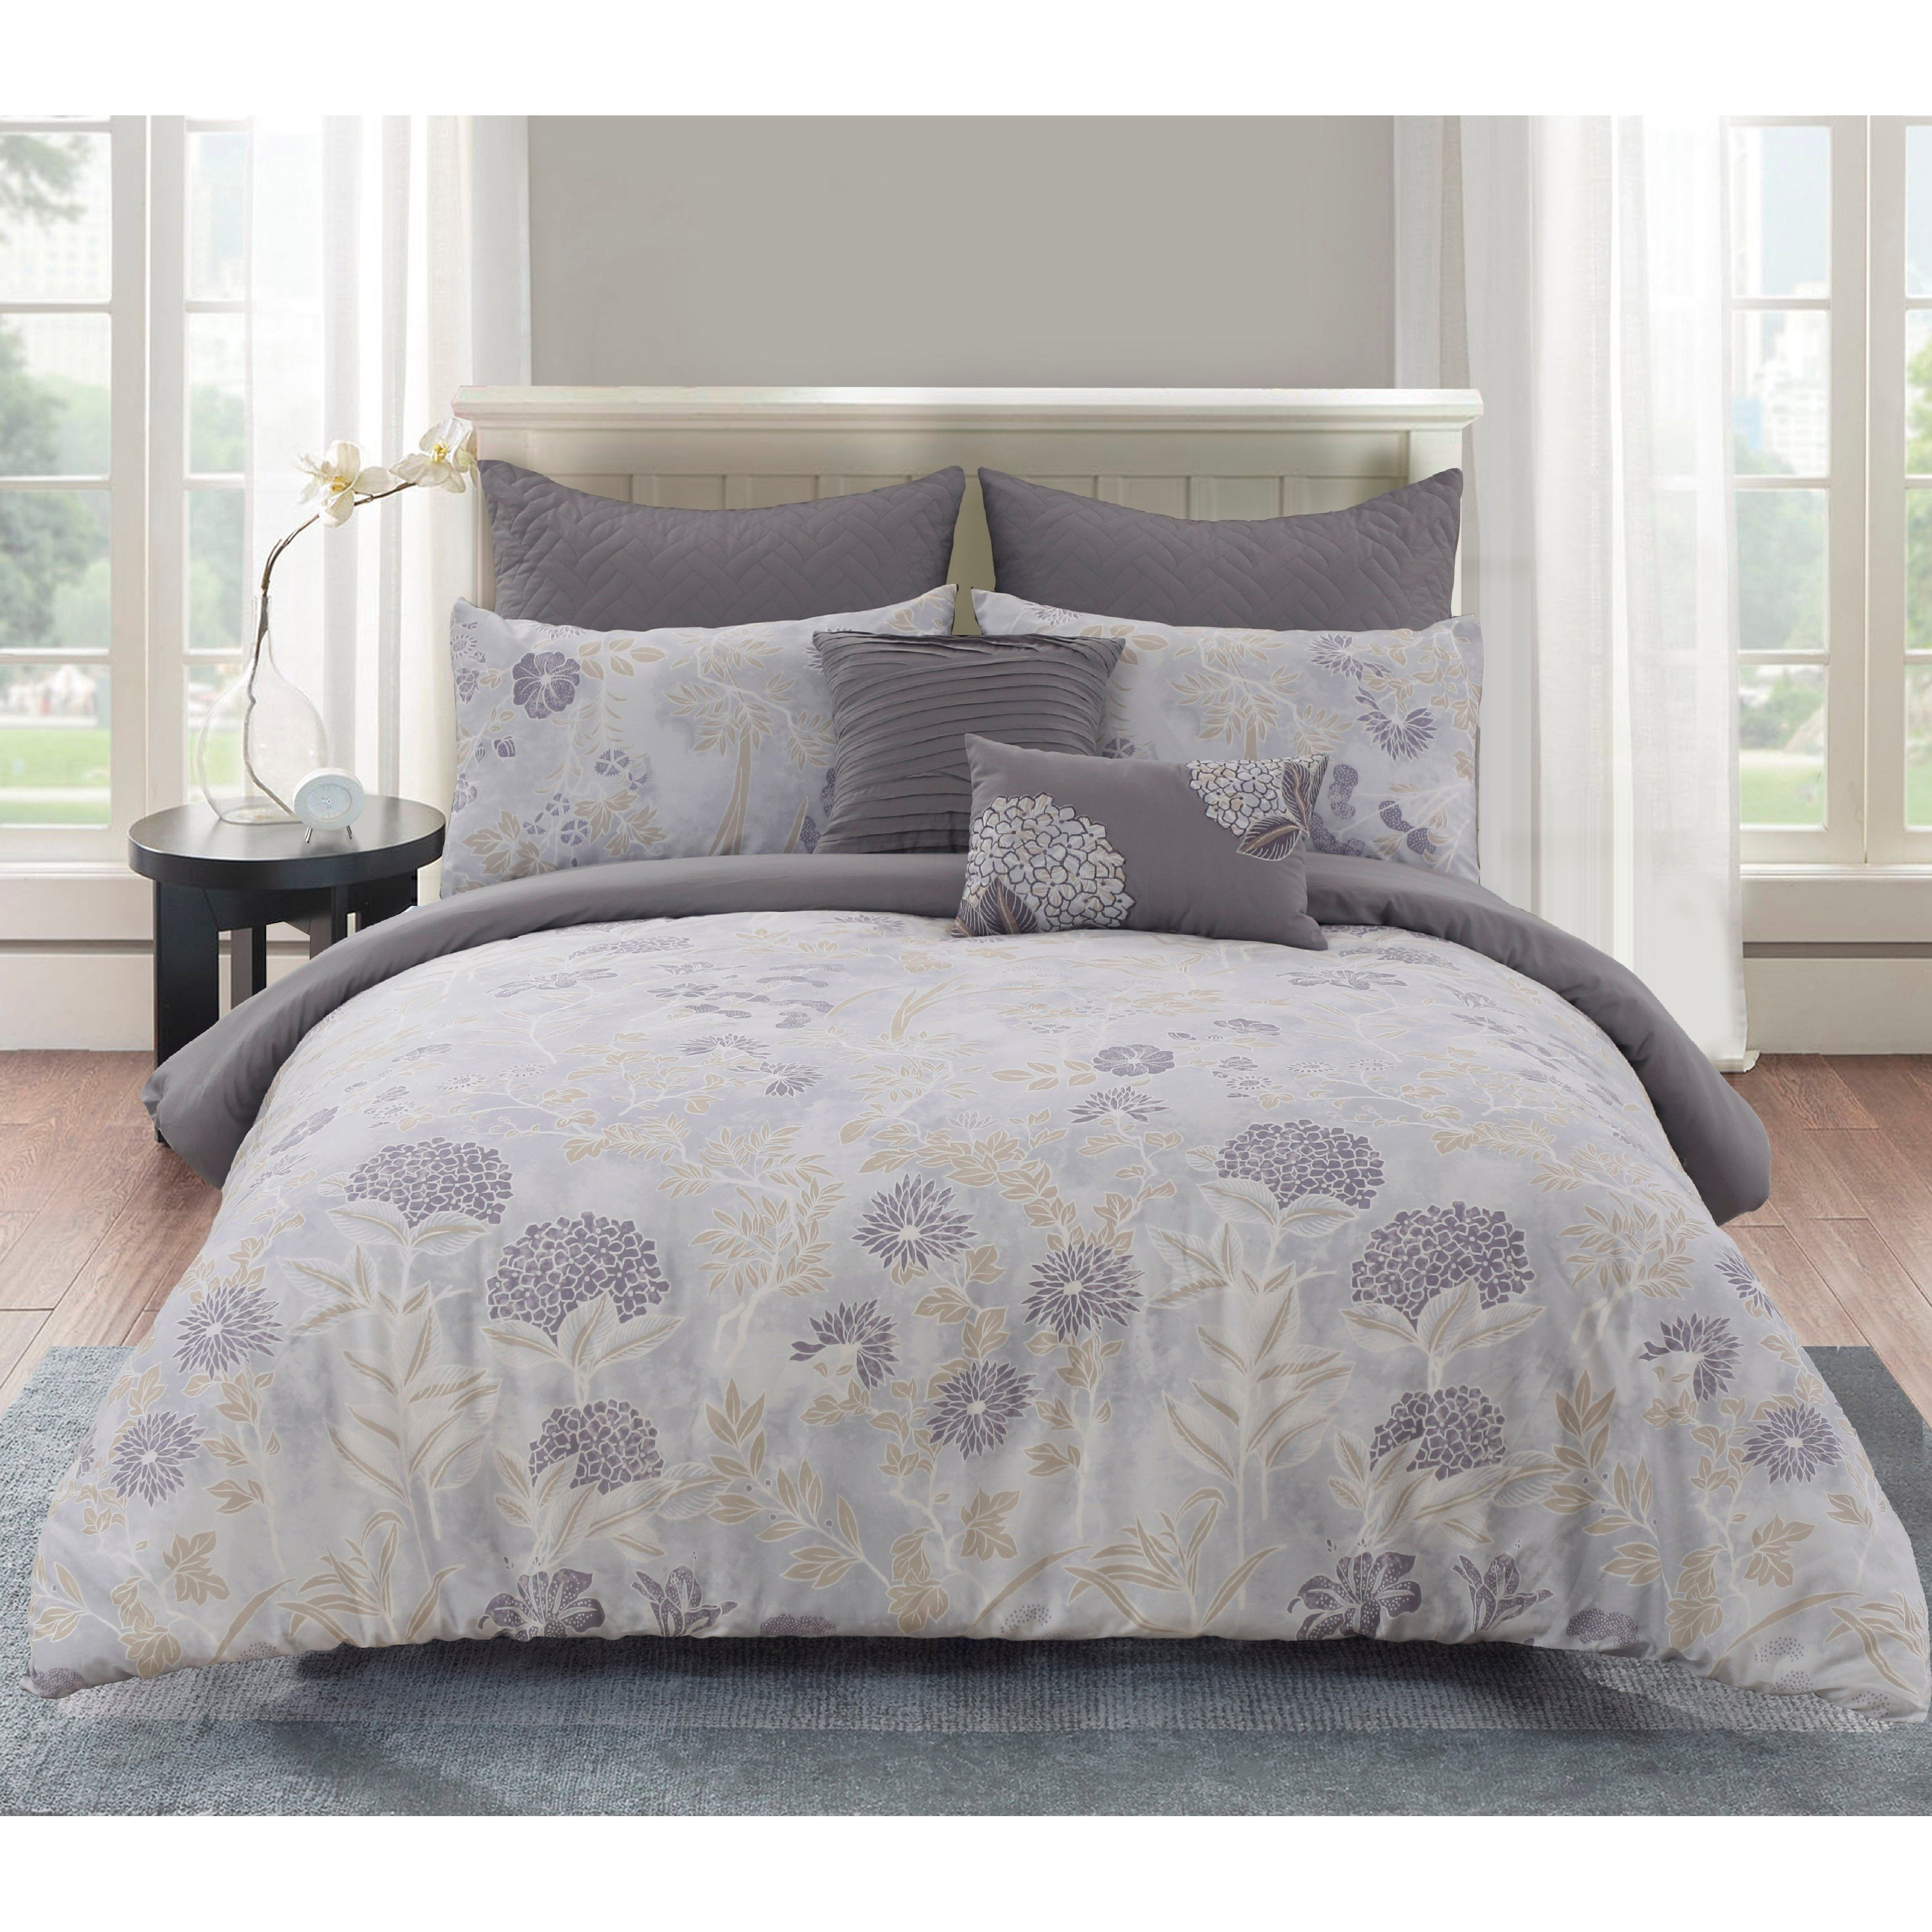 Aiko Cotton King Size Comforter Set In Purple As Is Item 15 Inch King In 2019 Comforter Sets Comforters King Size Comforter Sets